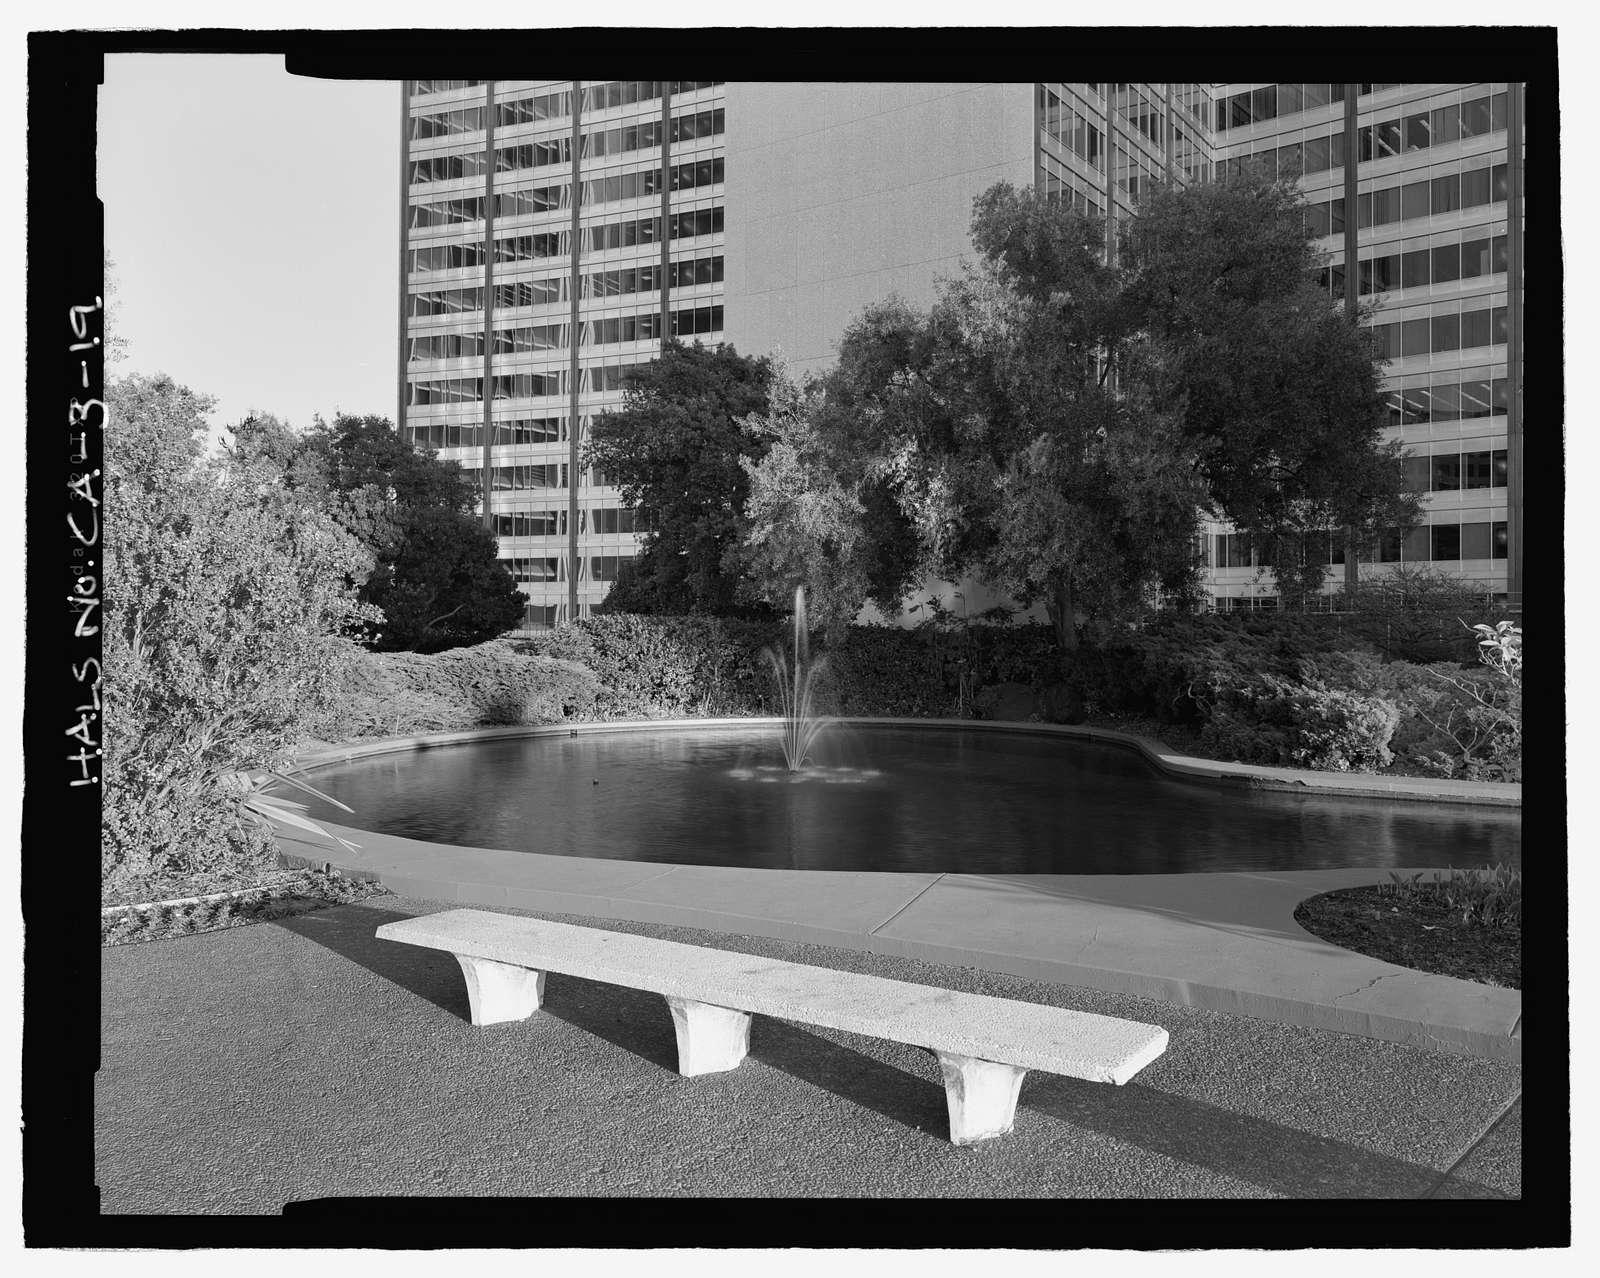 Kaiser Center, 300 Lakeside Drive, Oakland, Alameda County, CA